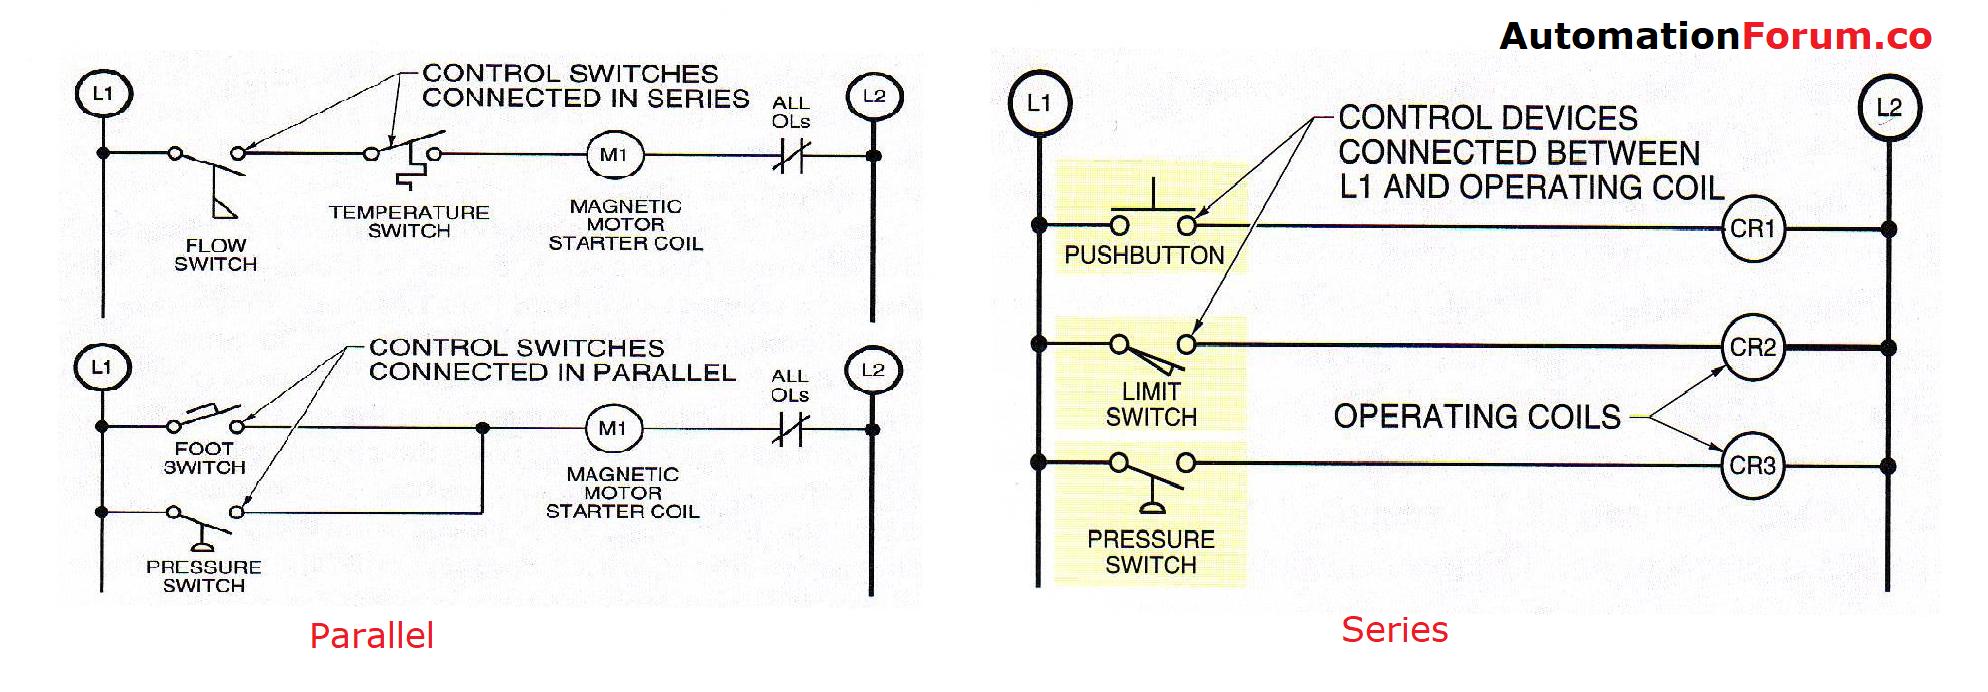 Ladder Logic Rule Instrumentation And Control Engineering